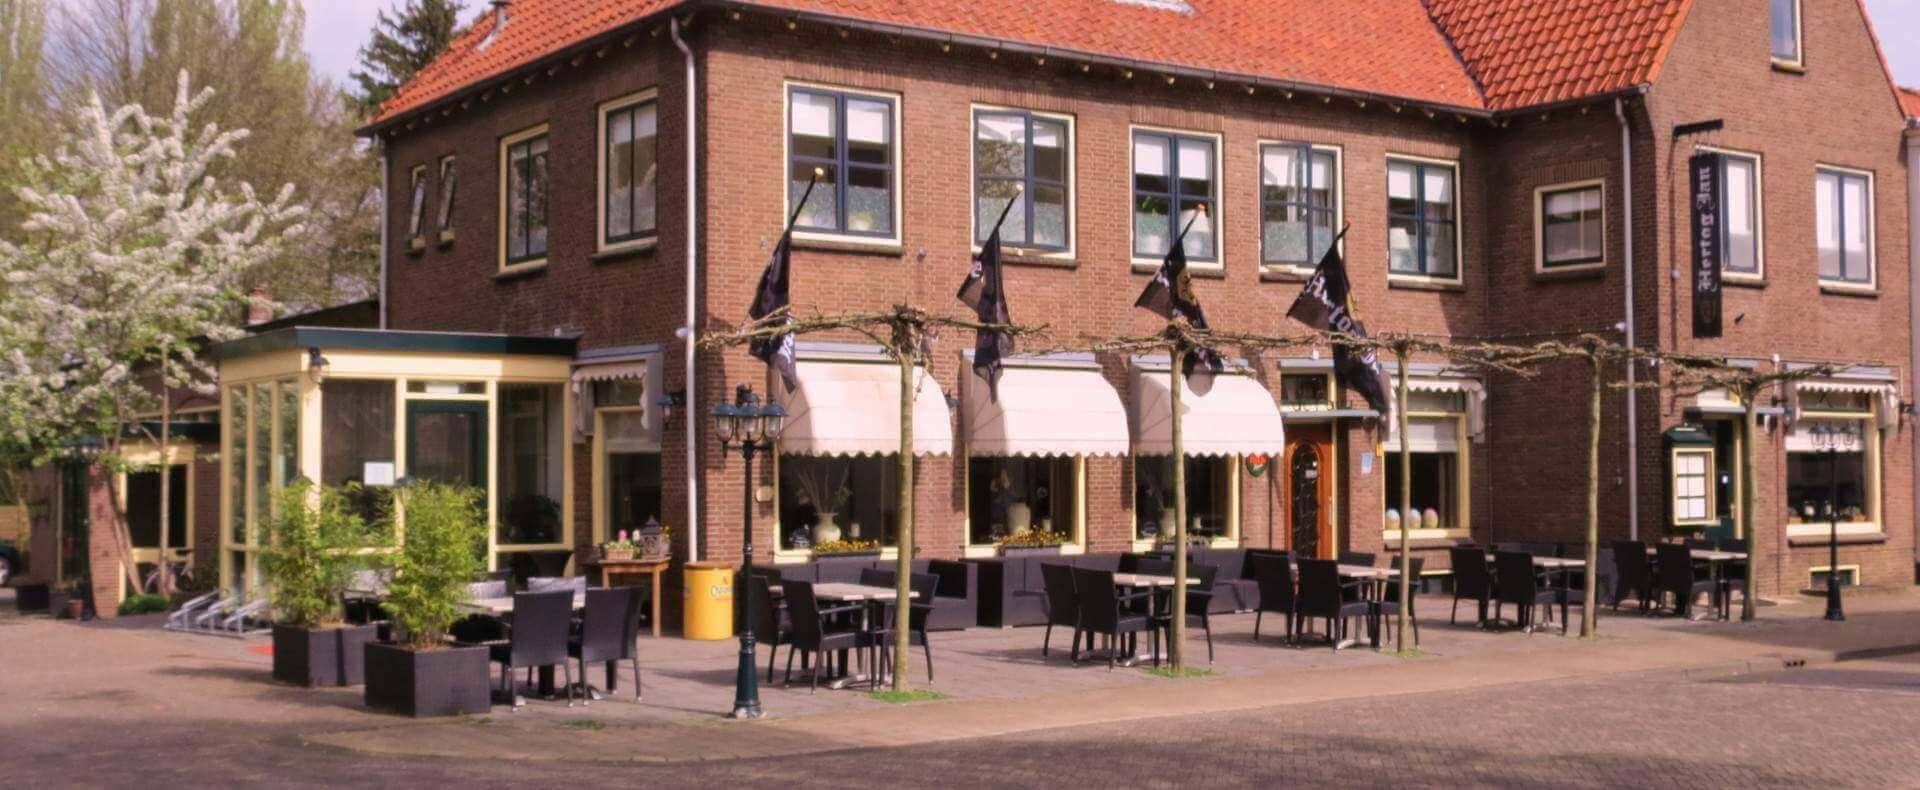 Grand- Café, Restaurant- Zaal de Pauw te Warnsveld